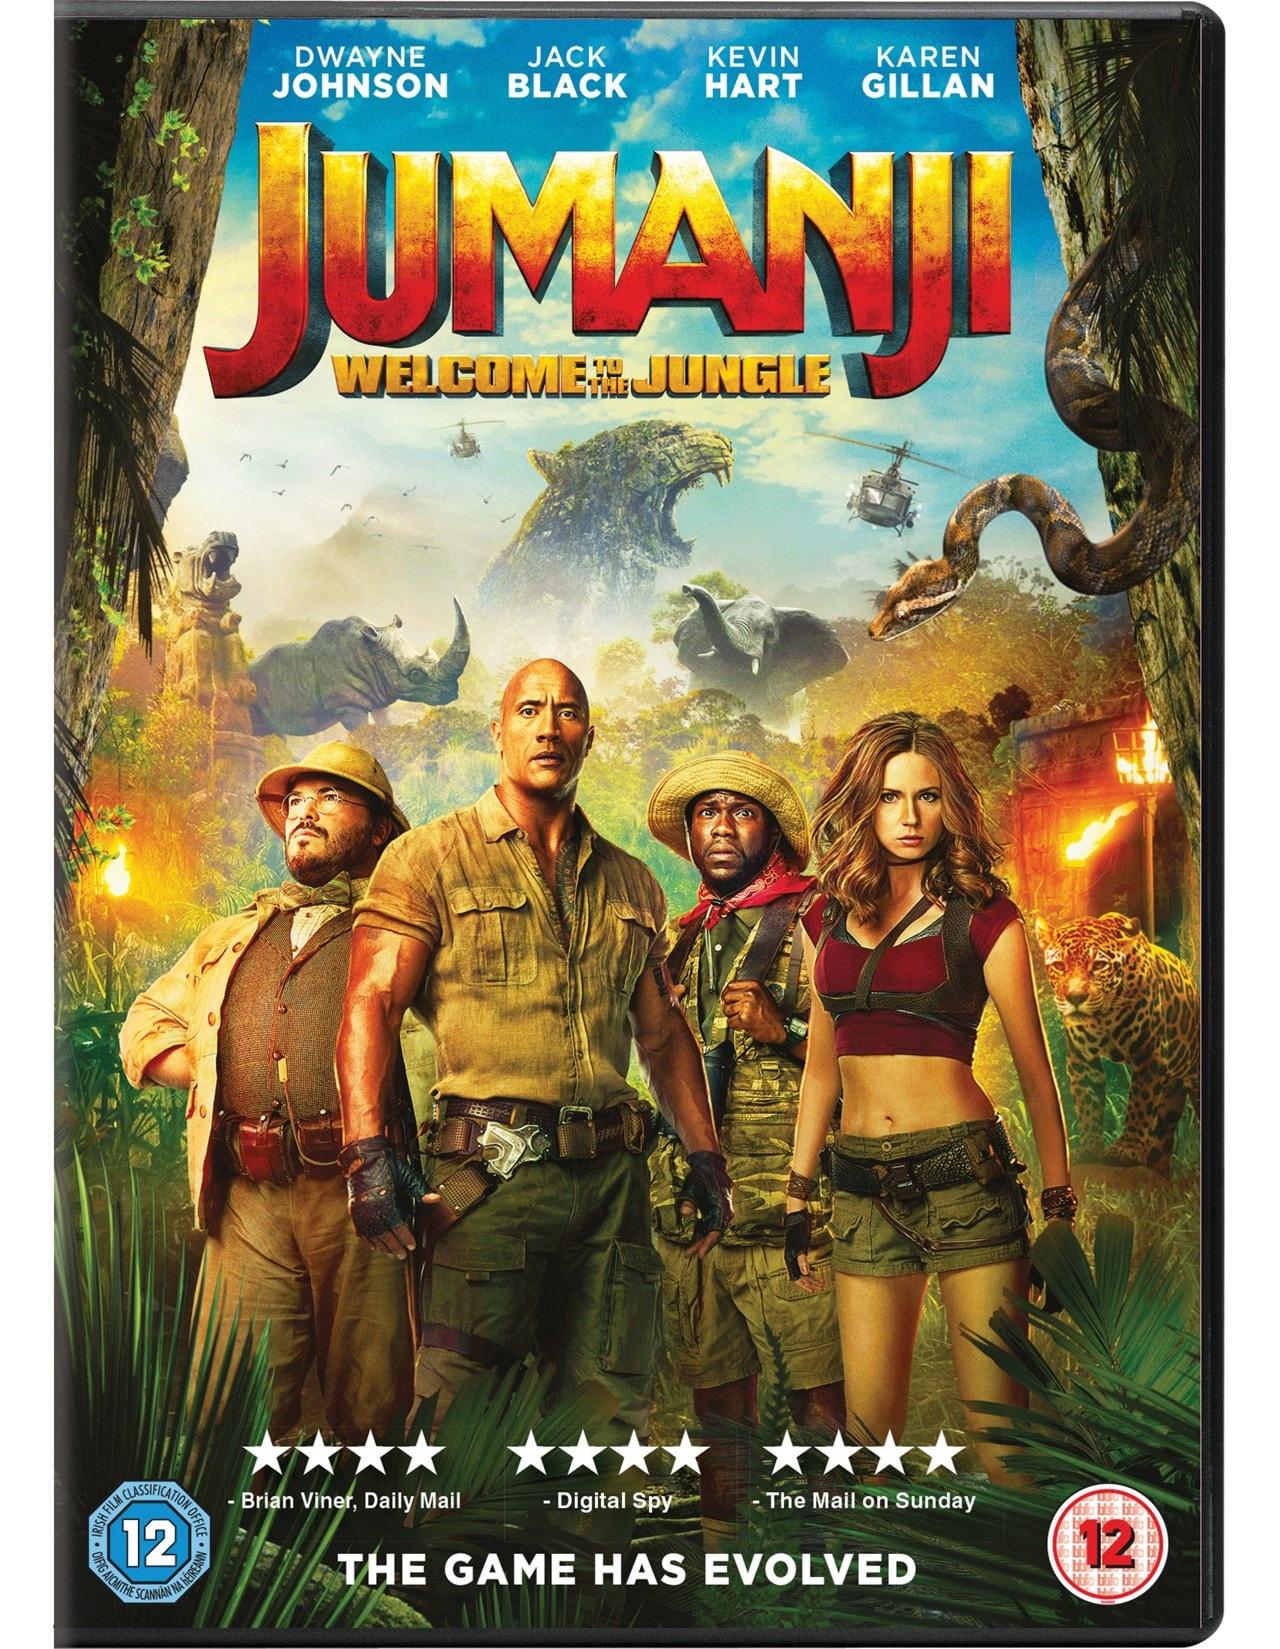 Jumanji: Welcome to the Jungle - 1